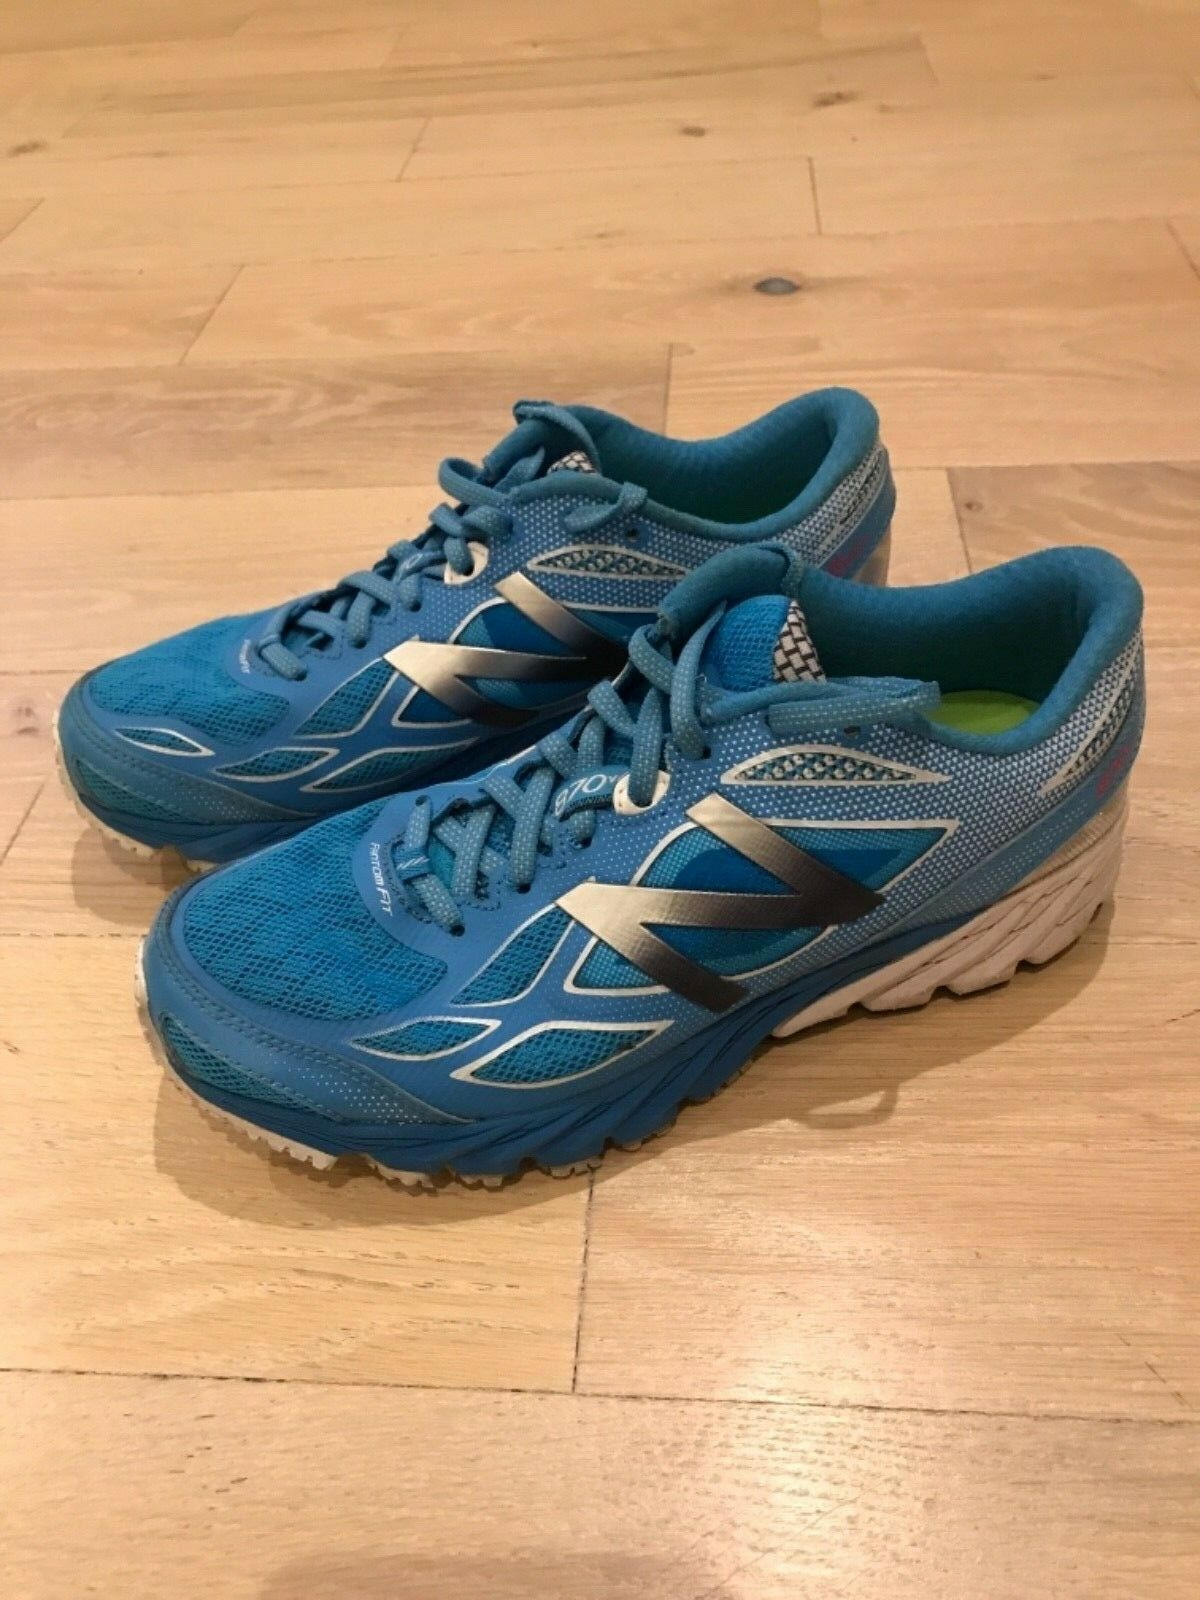 New Balance 870 V4 Women's Running Cross Training shoes Athletic 8 bluee White